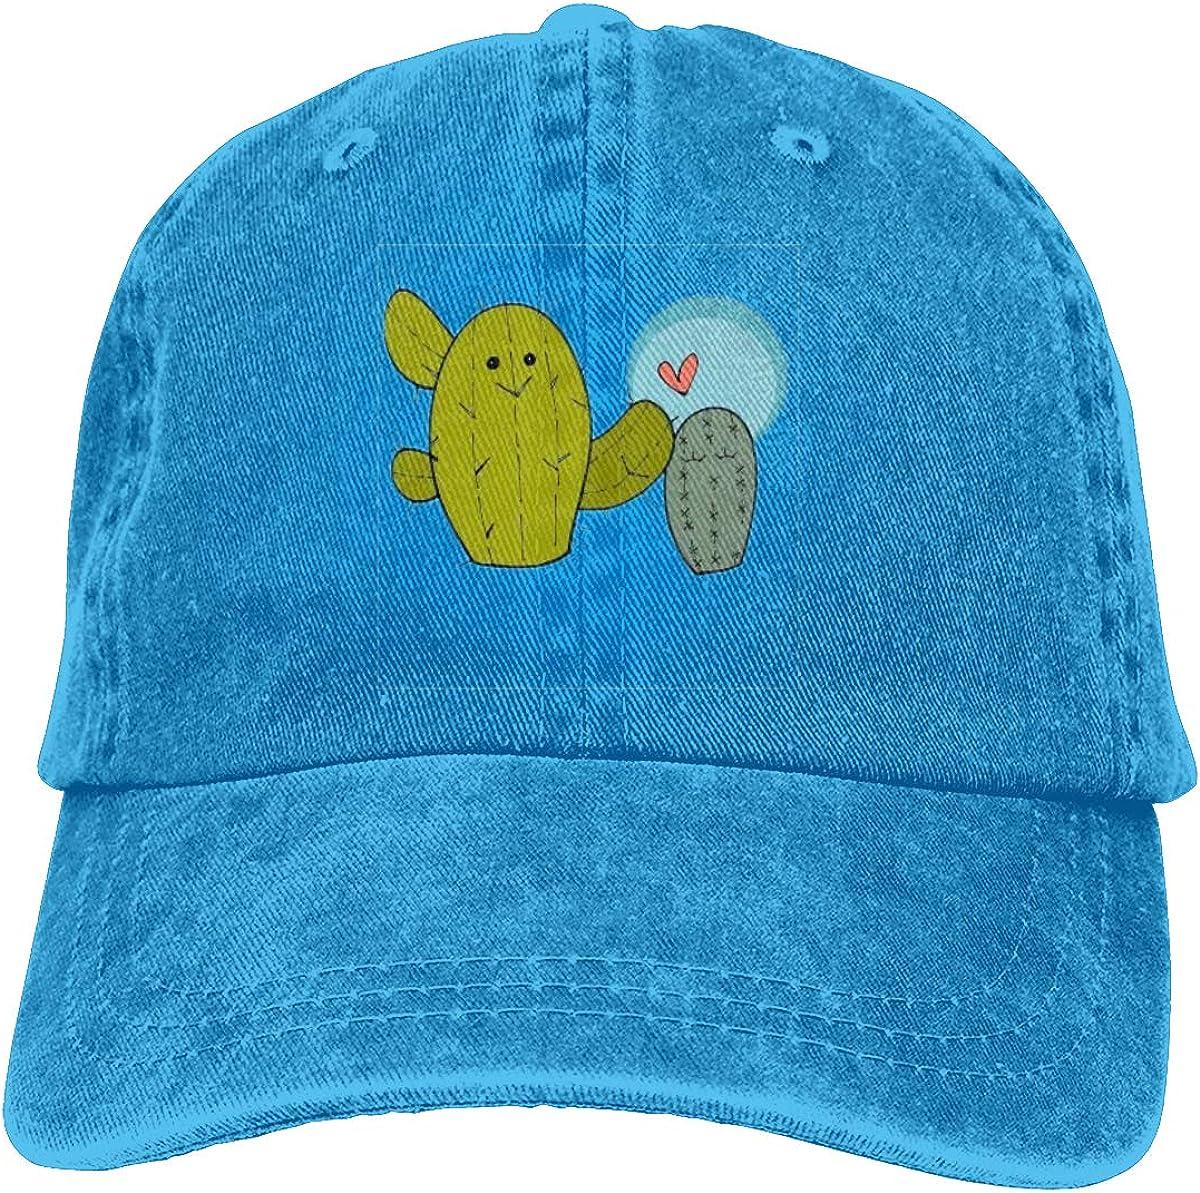 Cactus Puns are Succulent Unisex Baseball Cap Cotton Denim Amazing Adjustable Sun Hat for Men Women Youth Blue